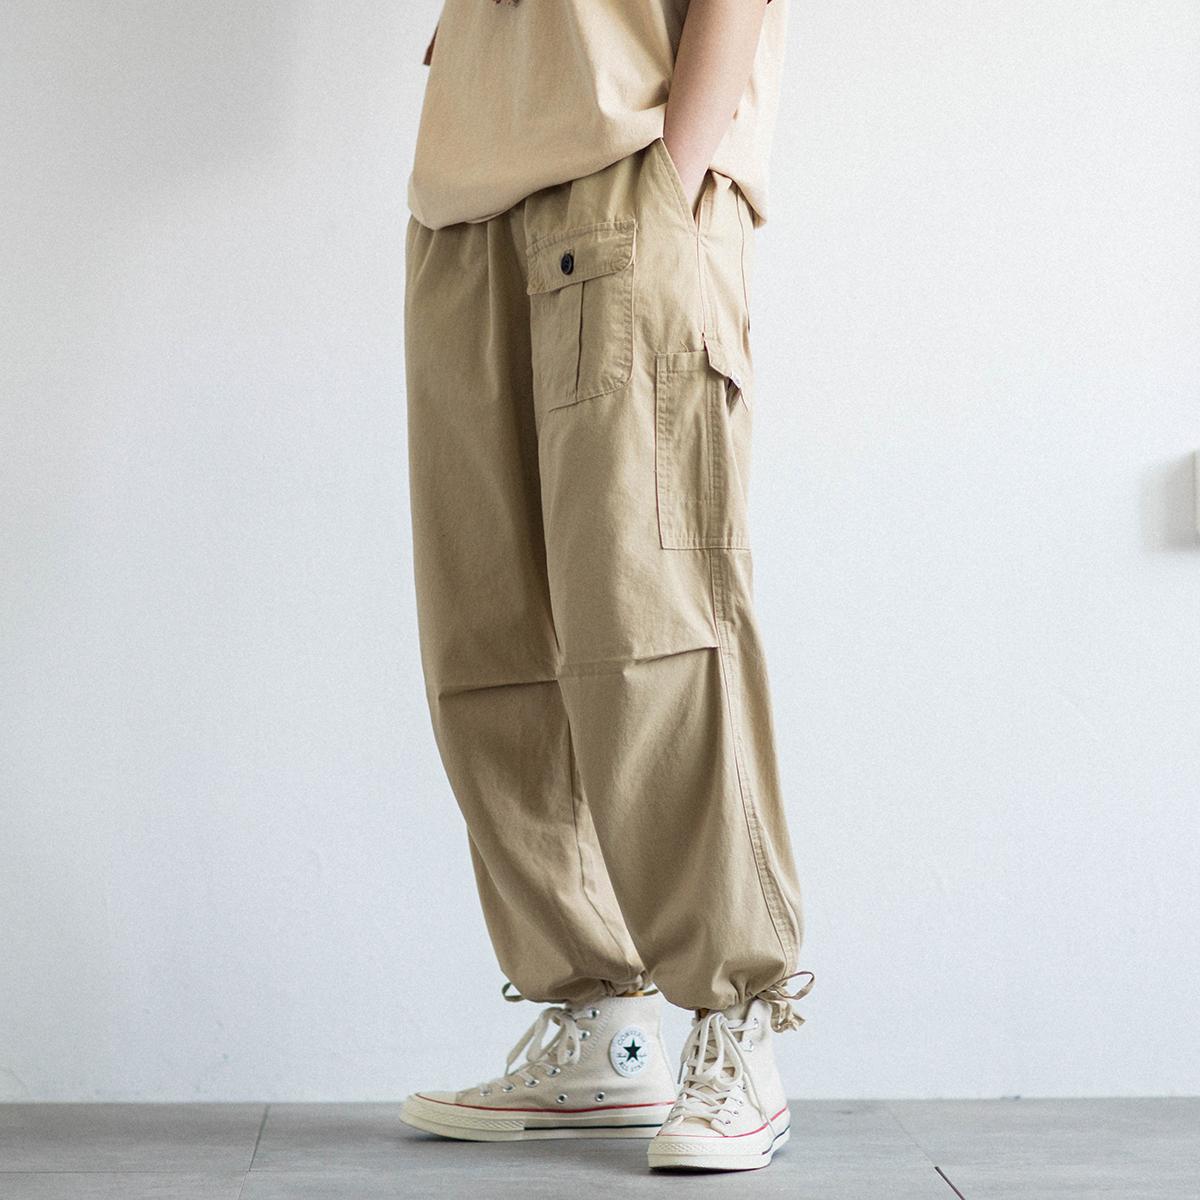 EpicSocotra日系法式寬松束腳工裝褲 夏季直筒九分褲燈籠褲男女潮